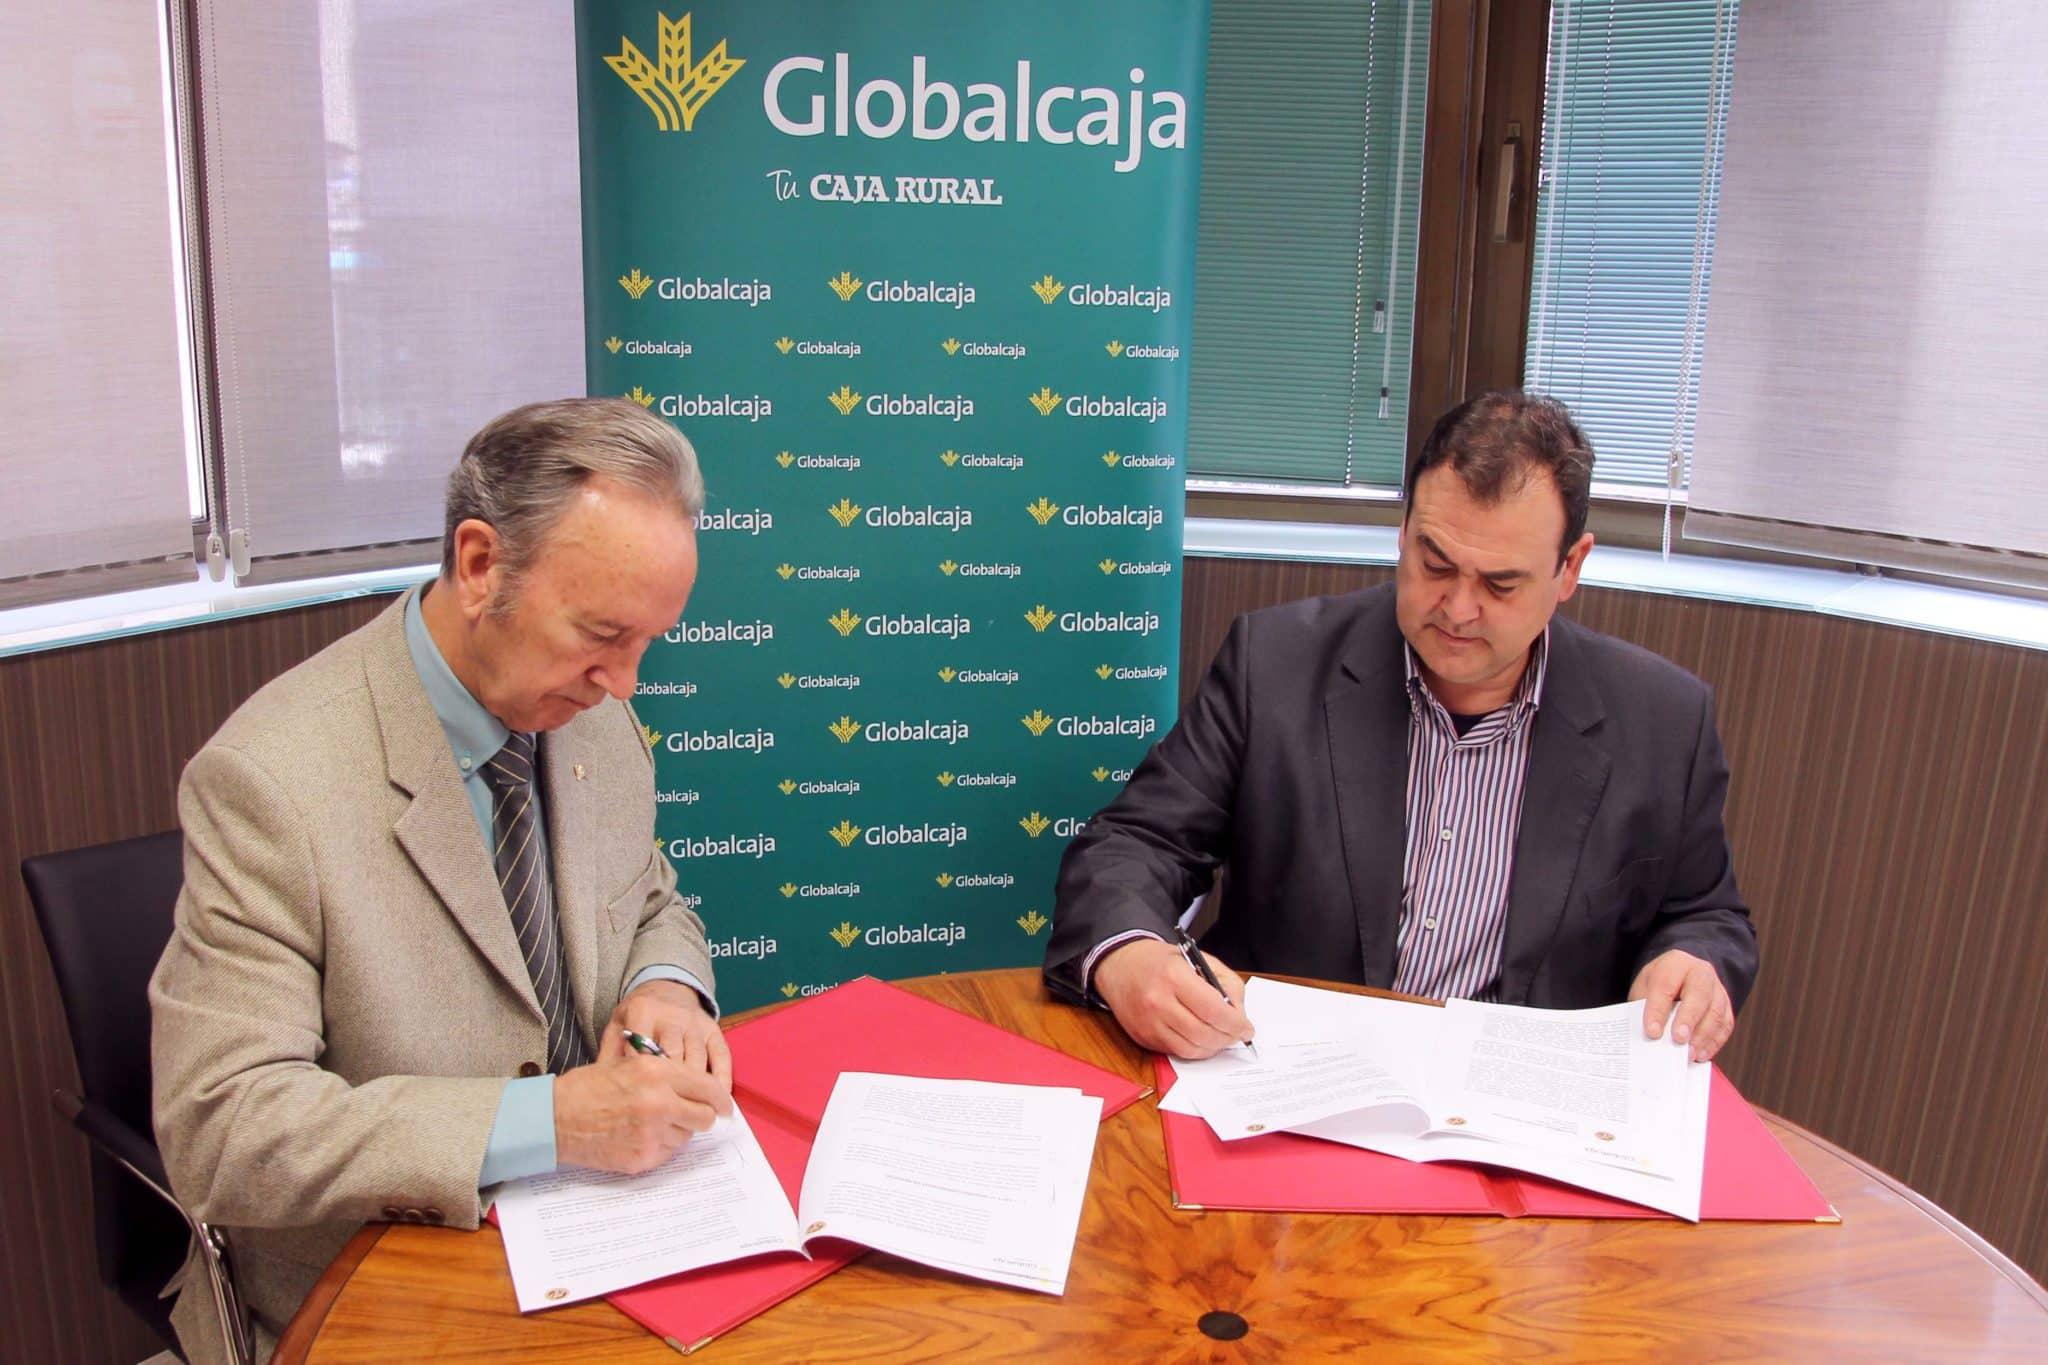 https://blog.globalcaja.es/wp-content/uploads/2015/10/FIRMA-CONVENIO-Globalcaja_balonmano-11_R.jpg